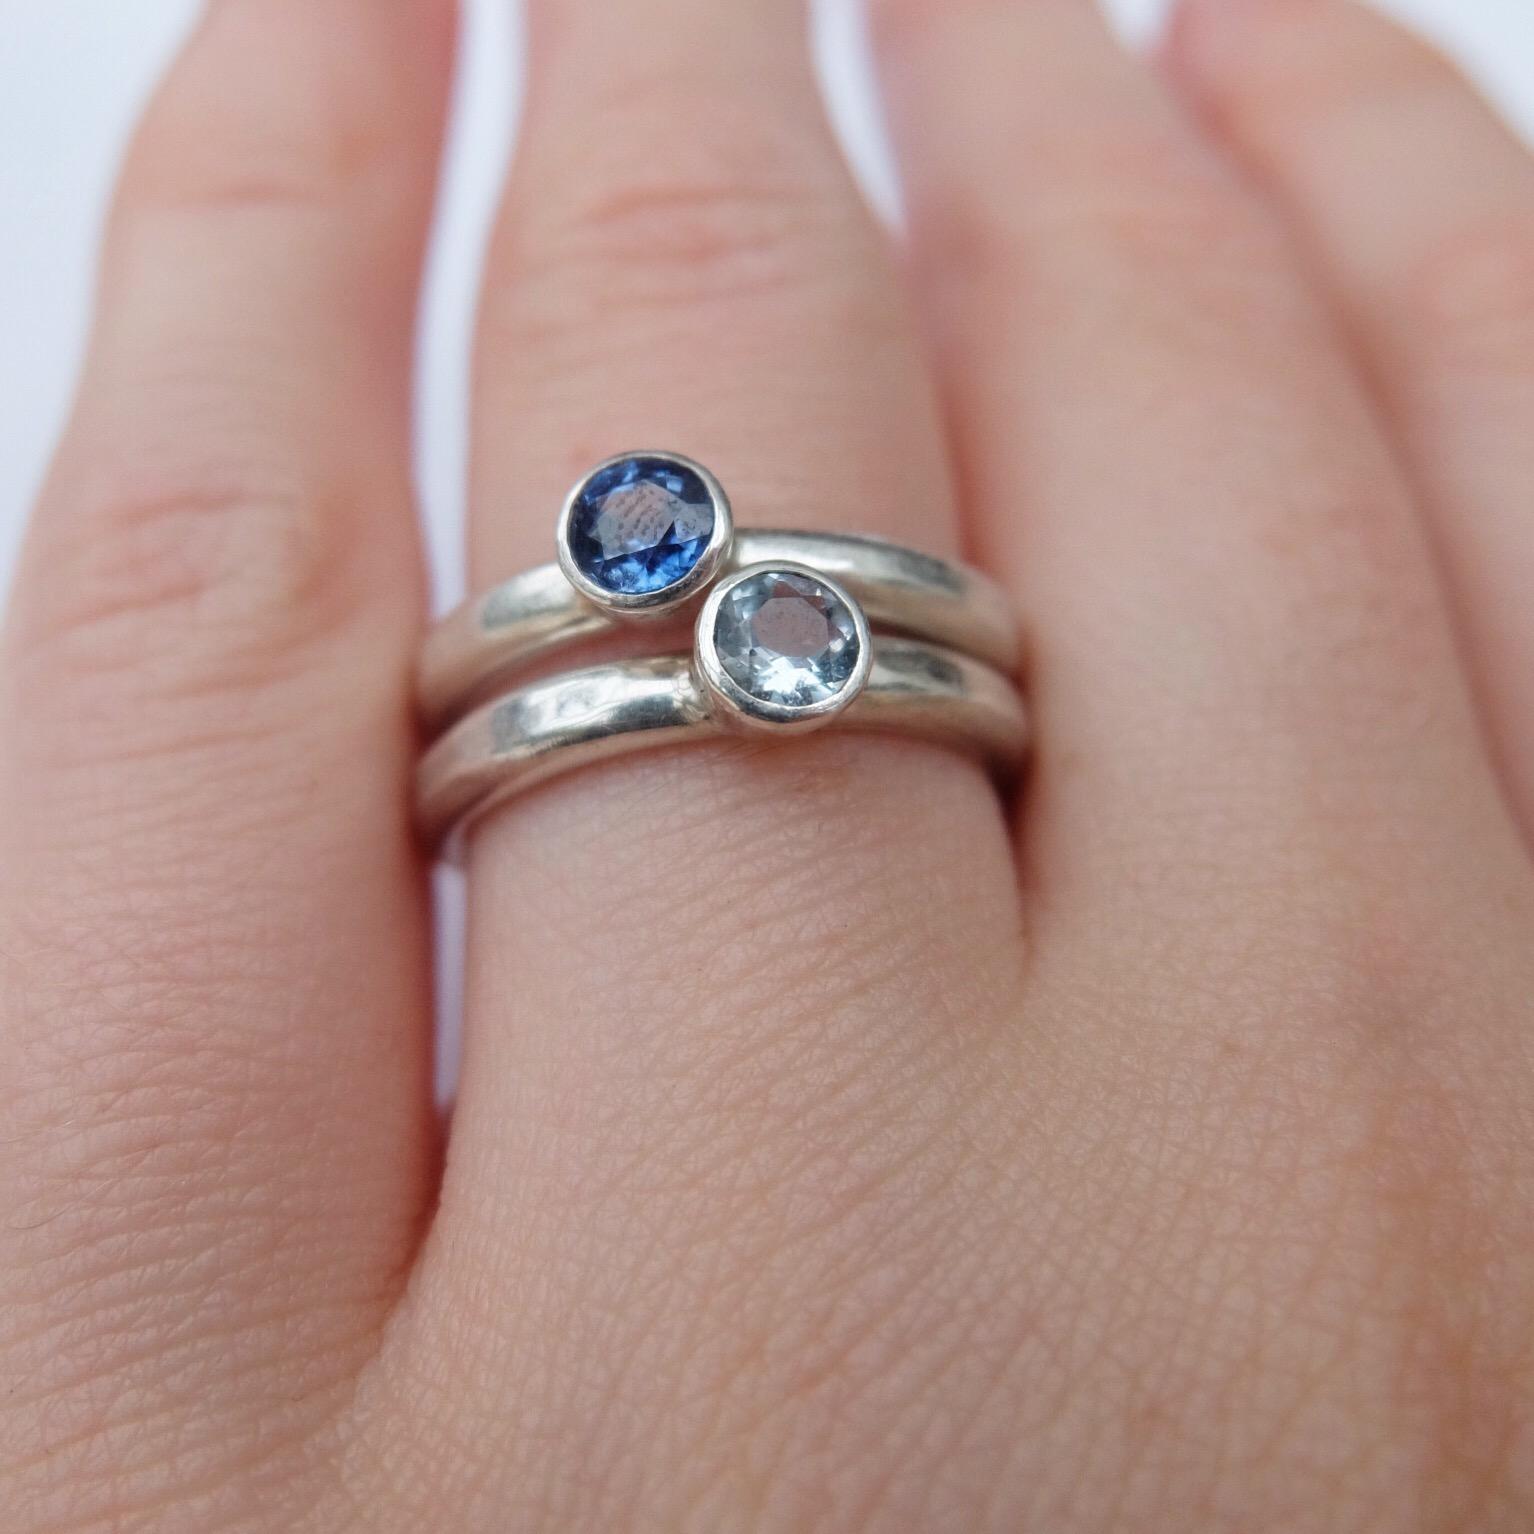 contemporary sapphire rings aquamarine handmade ring stacking rings contemporary chuny silver rings handmade uk devon exeter jasmine bowden simple jewellery jewelry jeweller.jpg